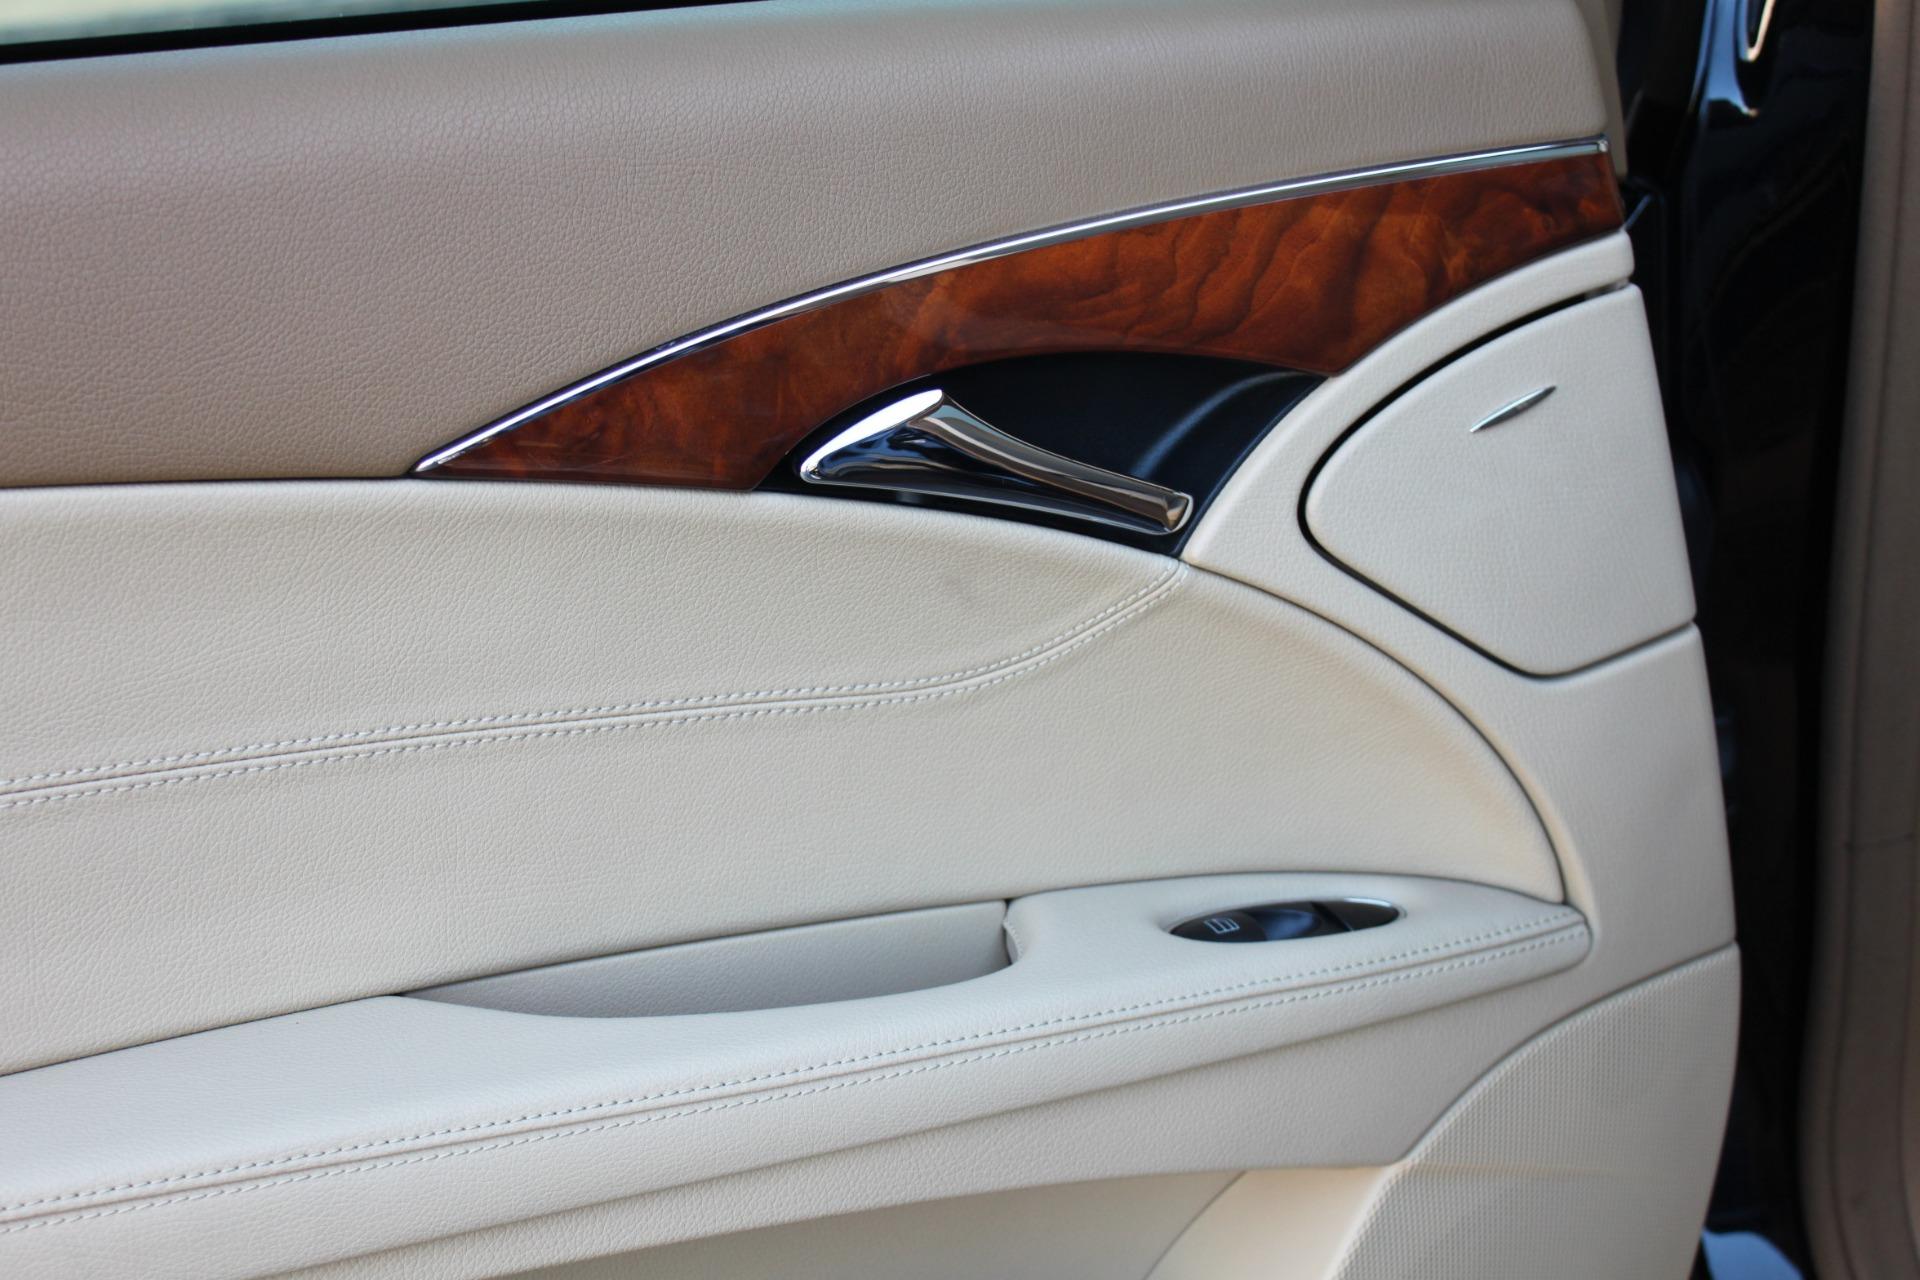 Used-2009-Mercedes-Benz-E-Class-E320-30L-BlueTEC-Lexus